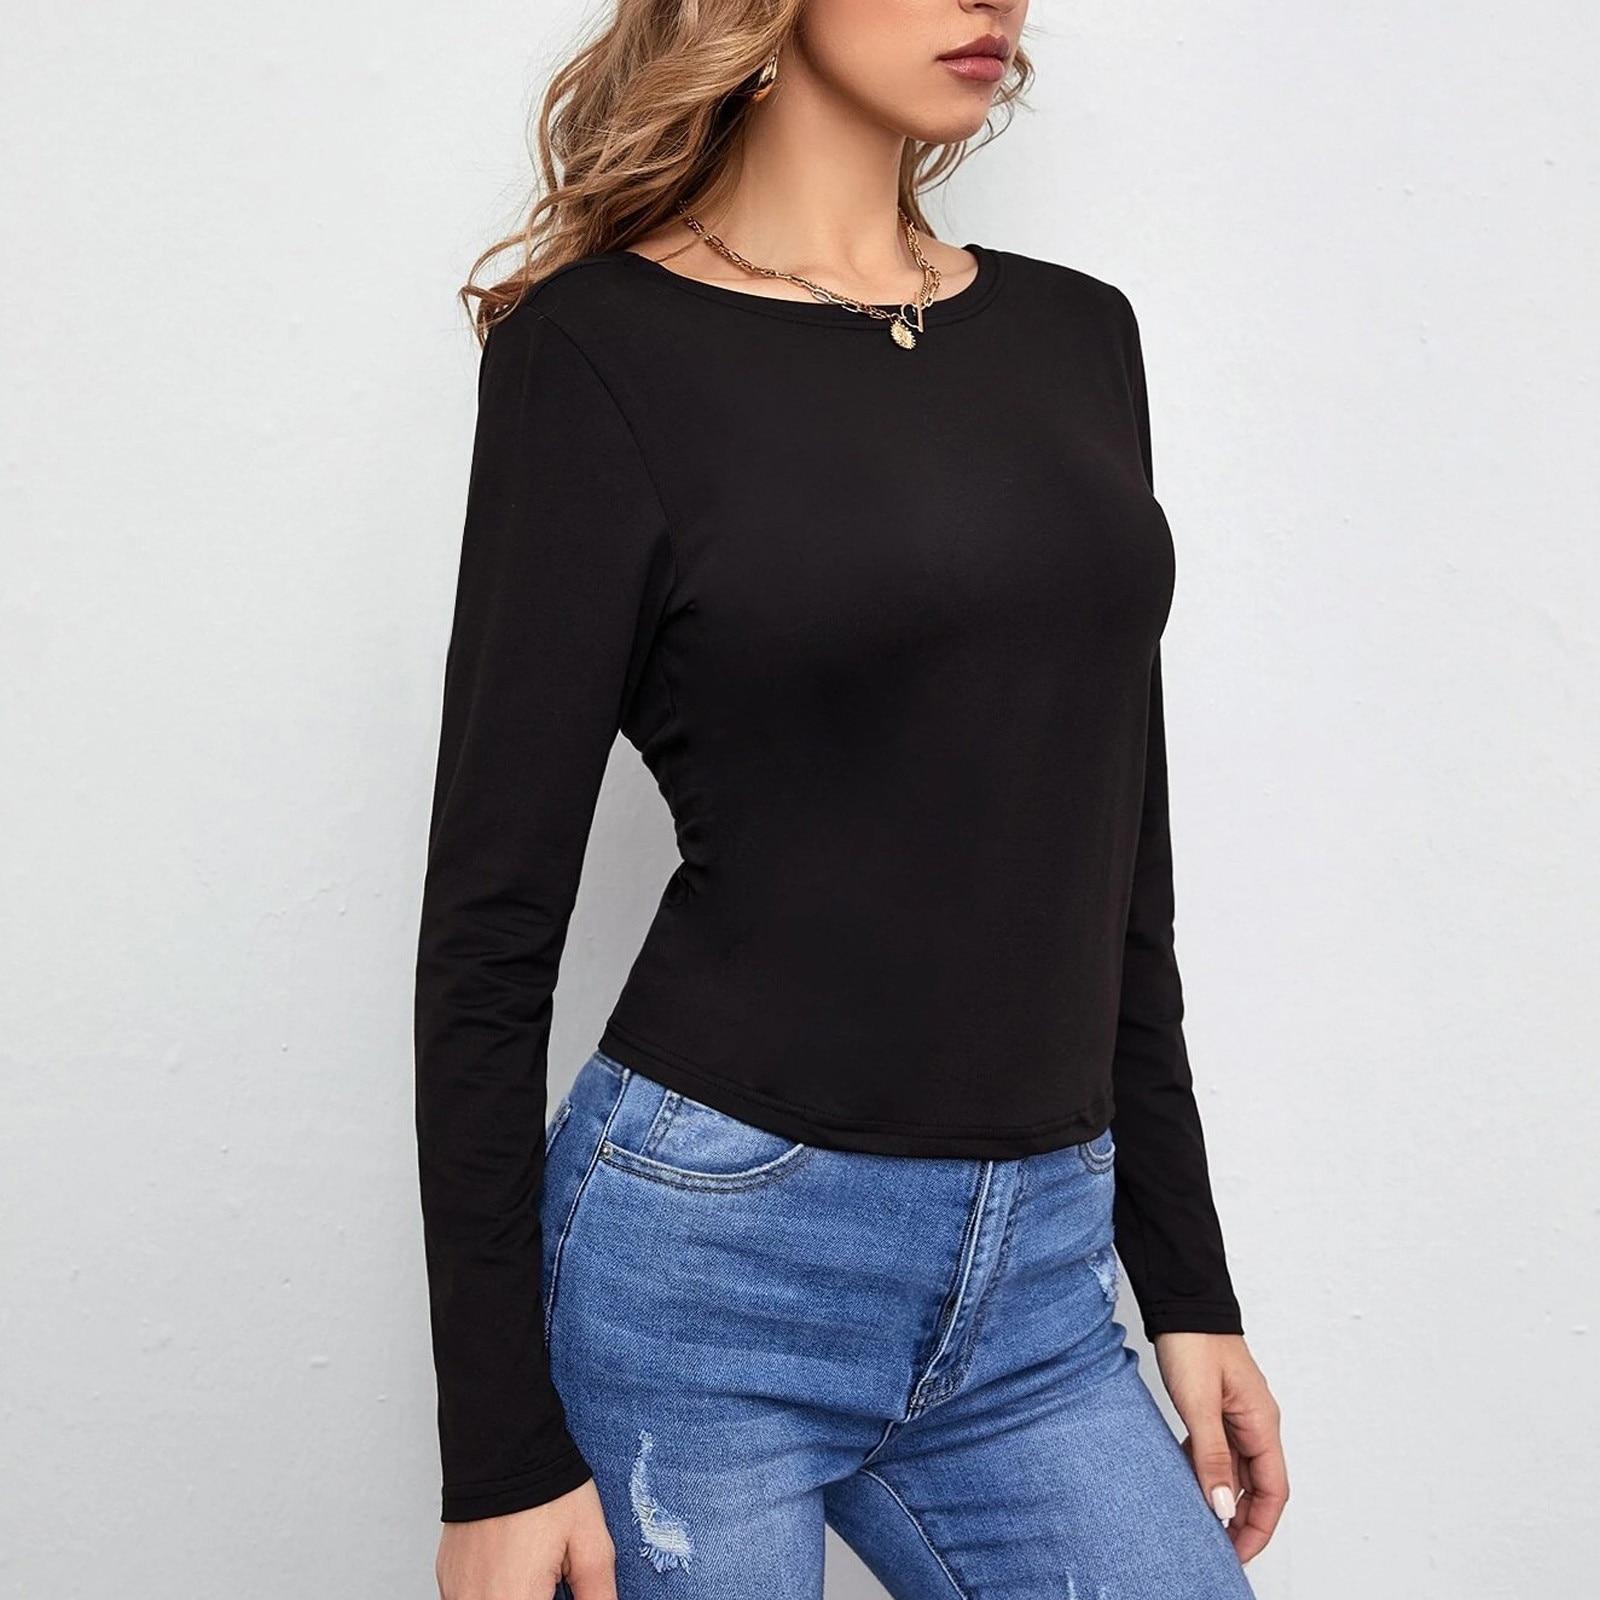 Harajuku Shirts For Women Sexy Bandage Backless Top Tee O-neck Long Sleeve Sport Women T Shirts Blusas Mujer De Moda 2021